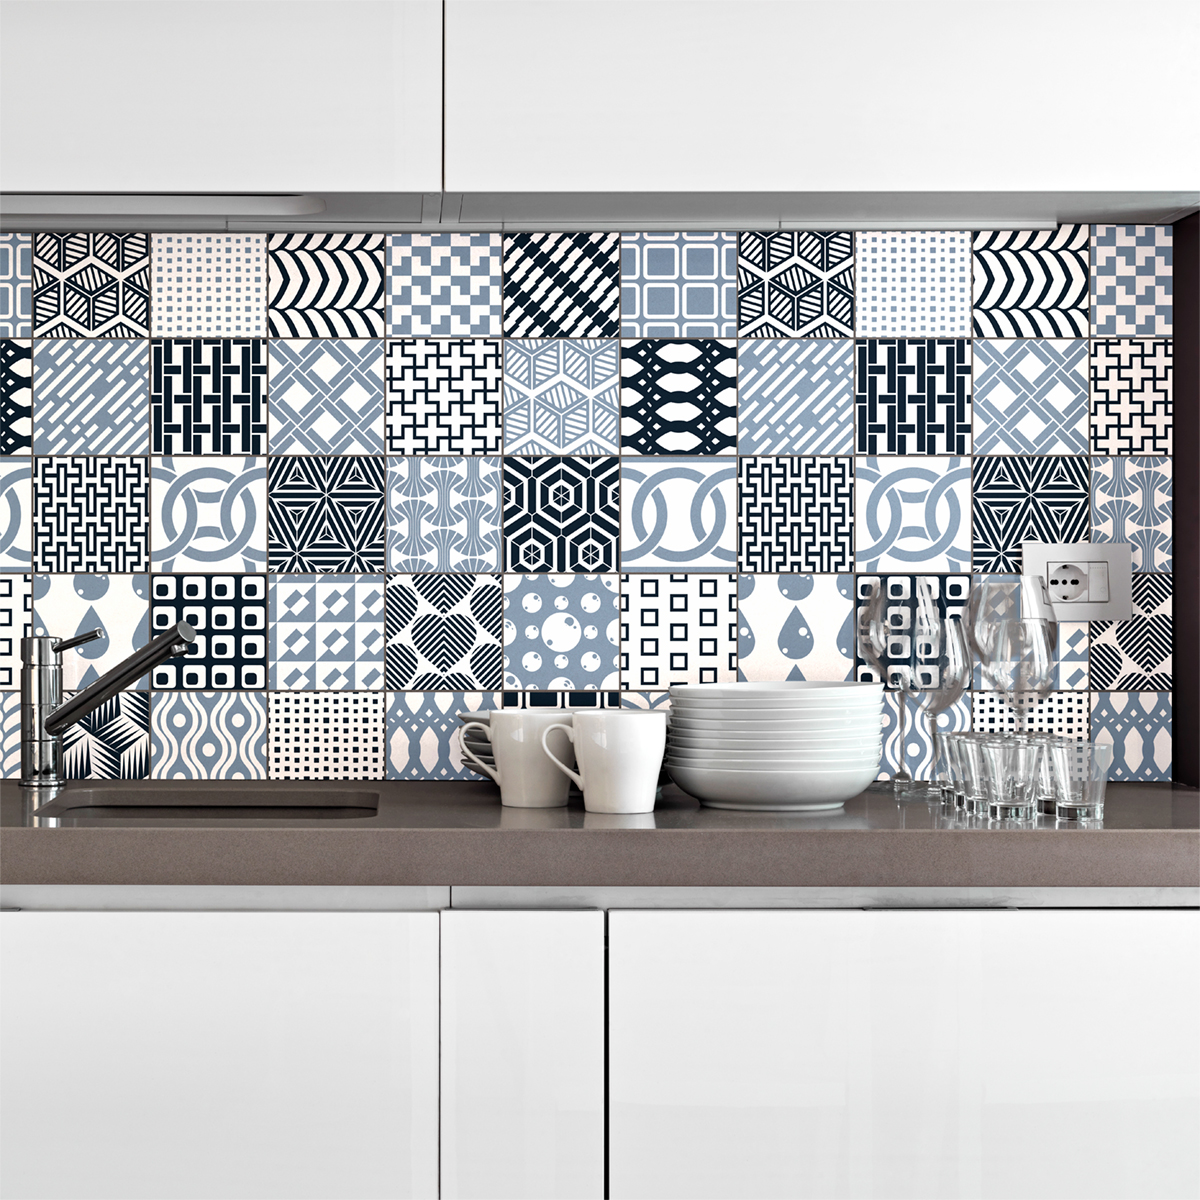 30 stickers carrelages scandinave helsingborg cuisine carrelages ambiance sticker. Black Bedroom Furniture Sets. Home Design Ideas